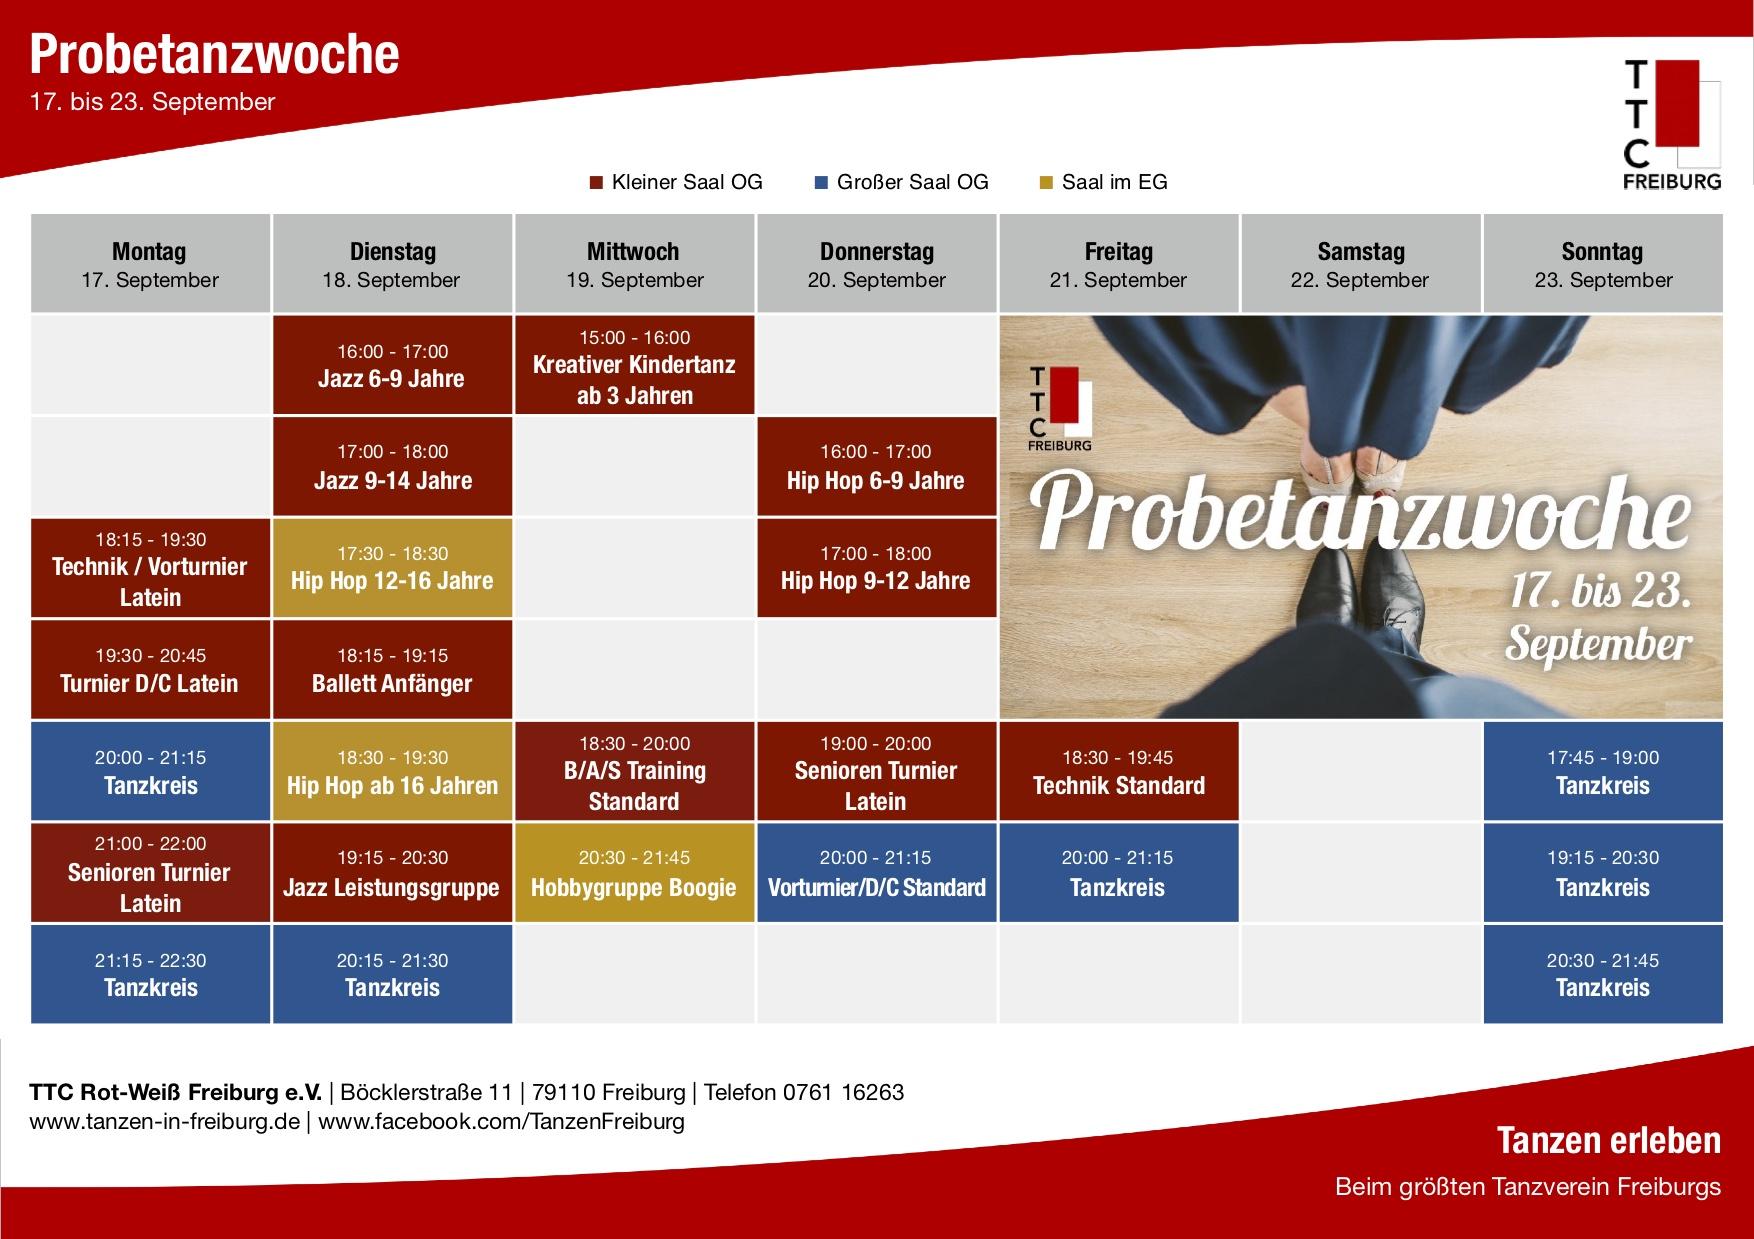 Aktuelles – TTC Rot-Weiß Freiburg e.V. – Tanzen in Freiburg